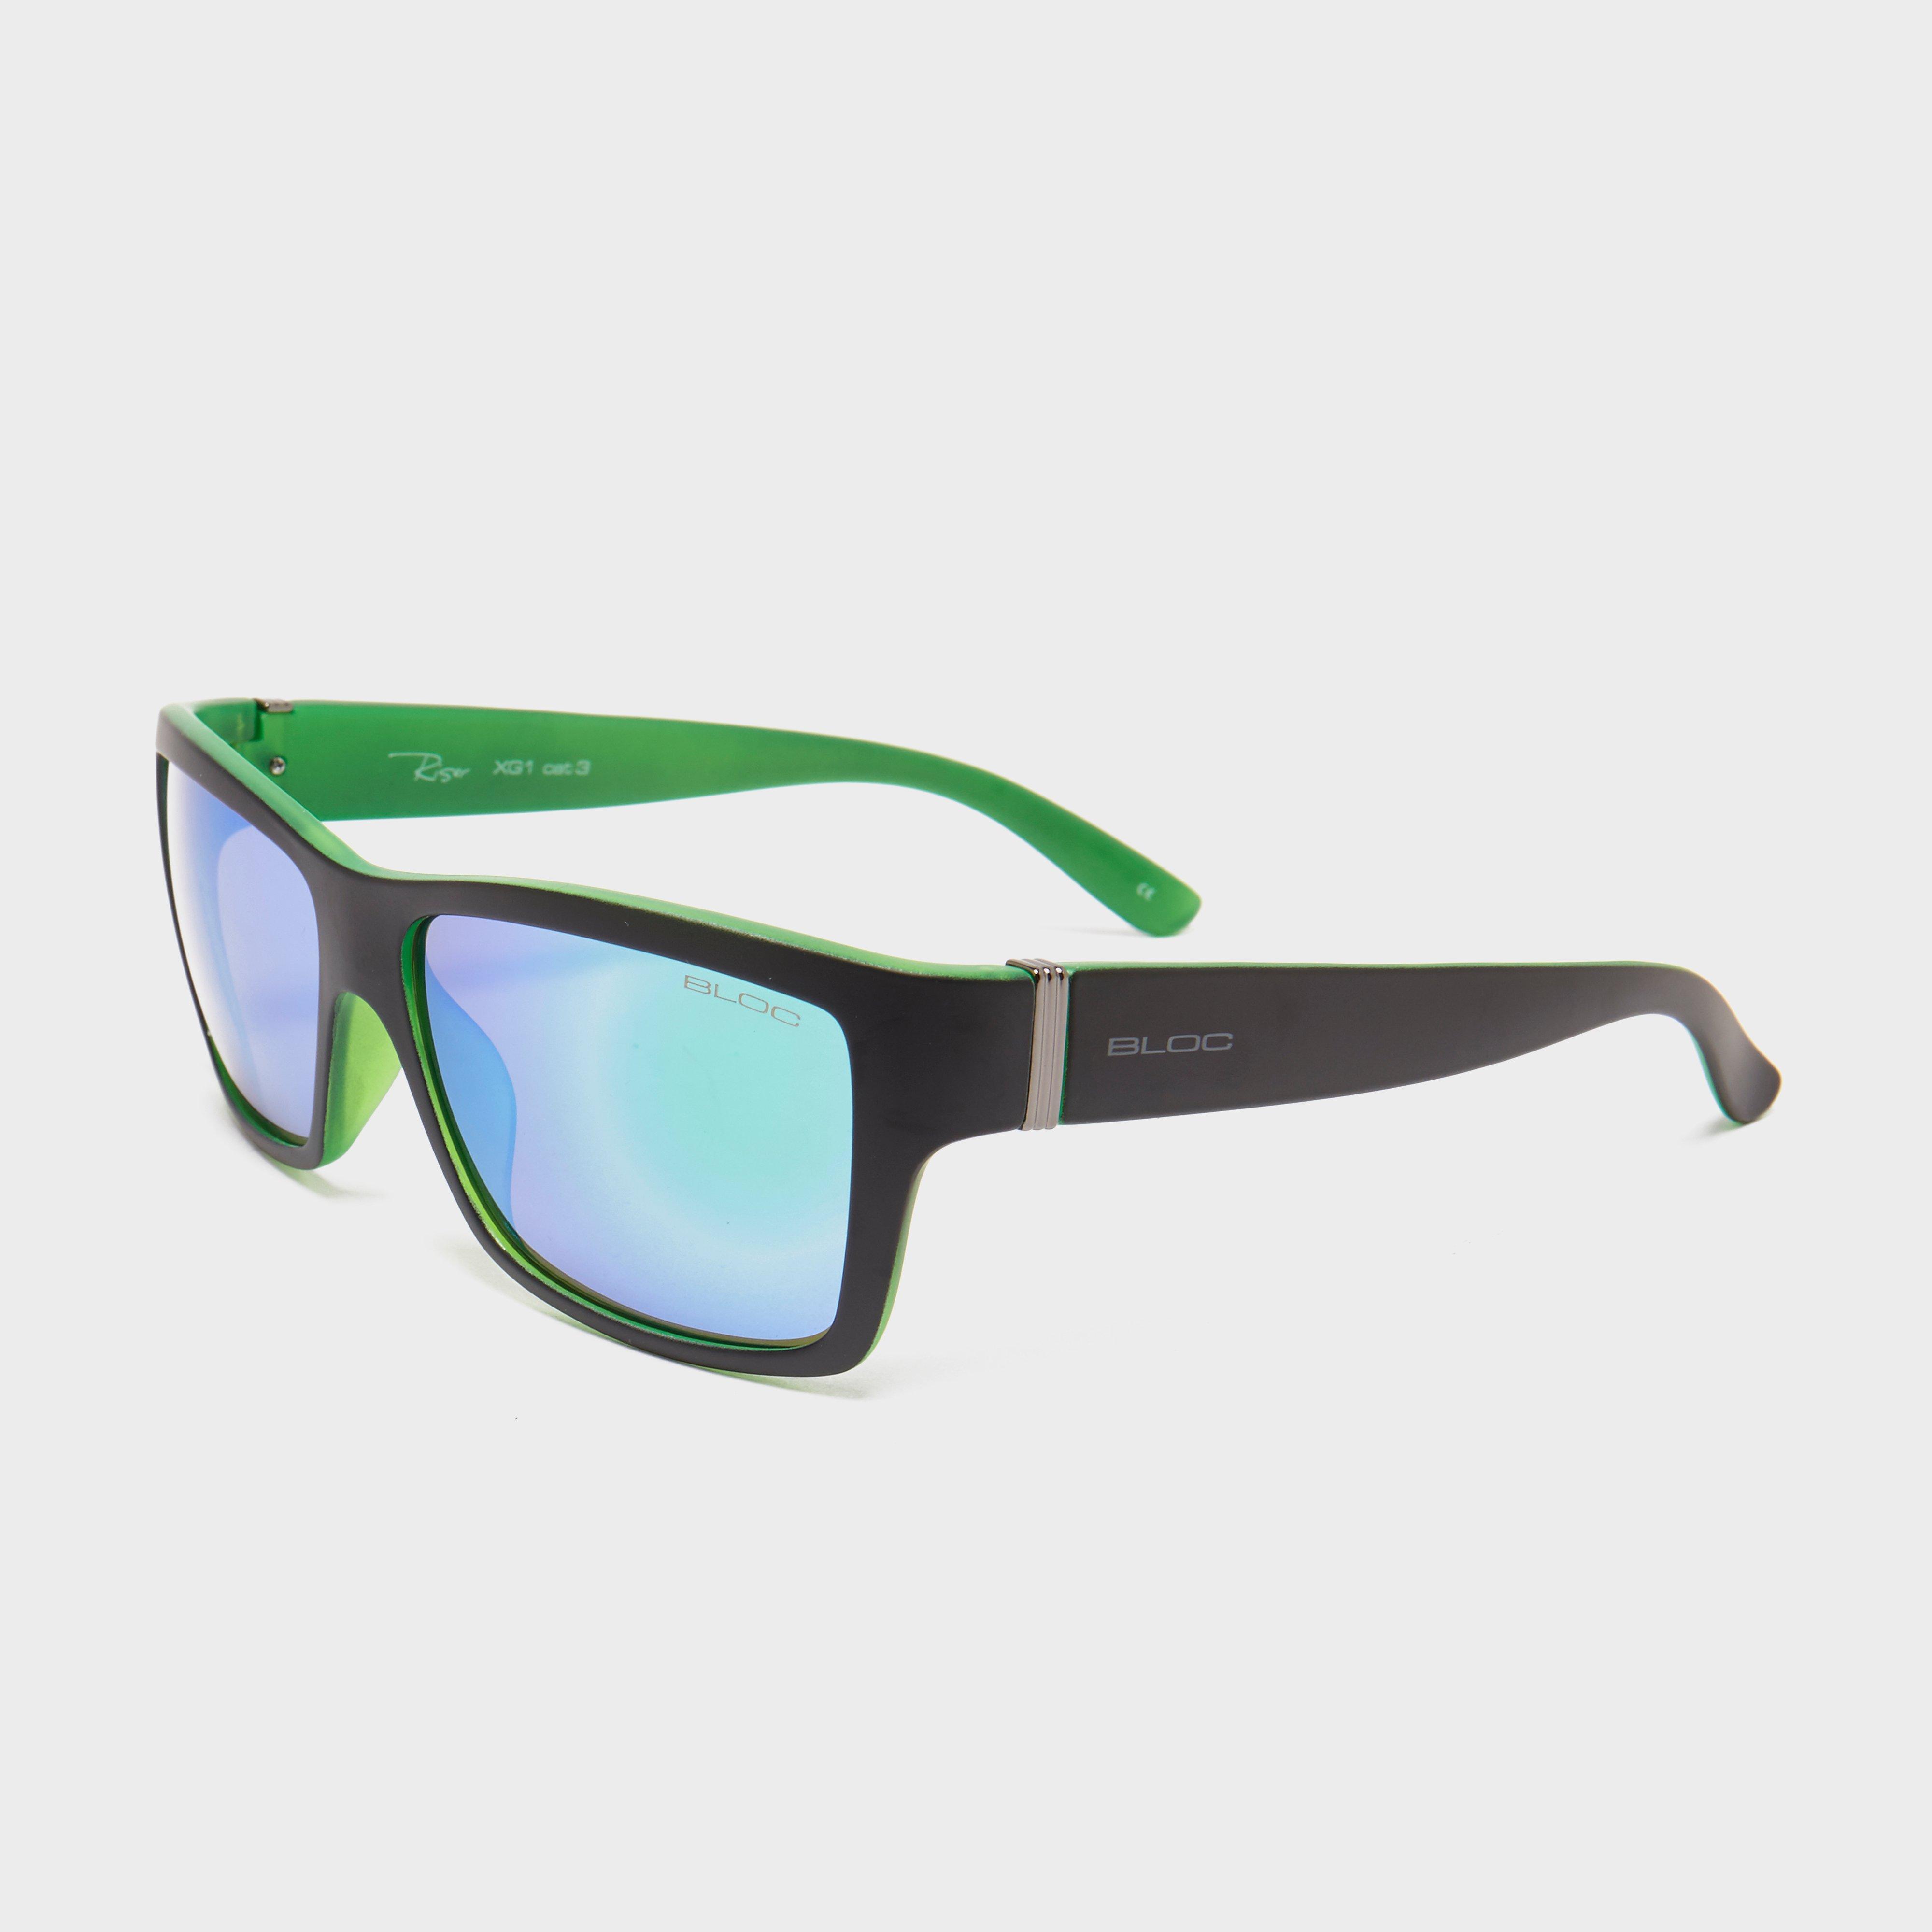 Bloc Mens Riser Sunglasses - Black/blk/grn  Black/blk/grn